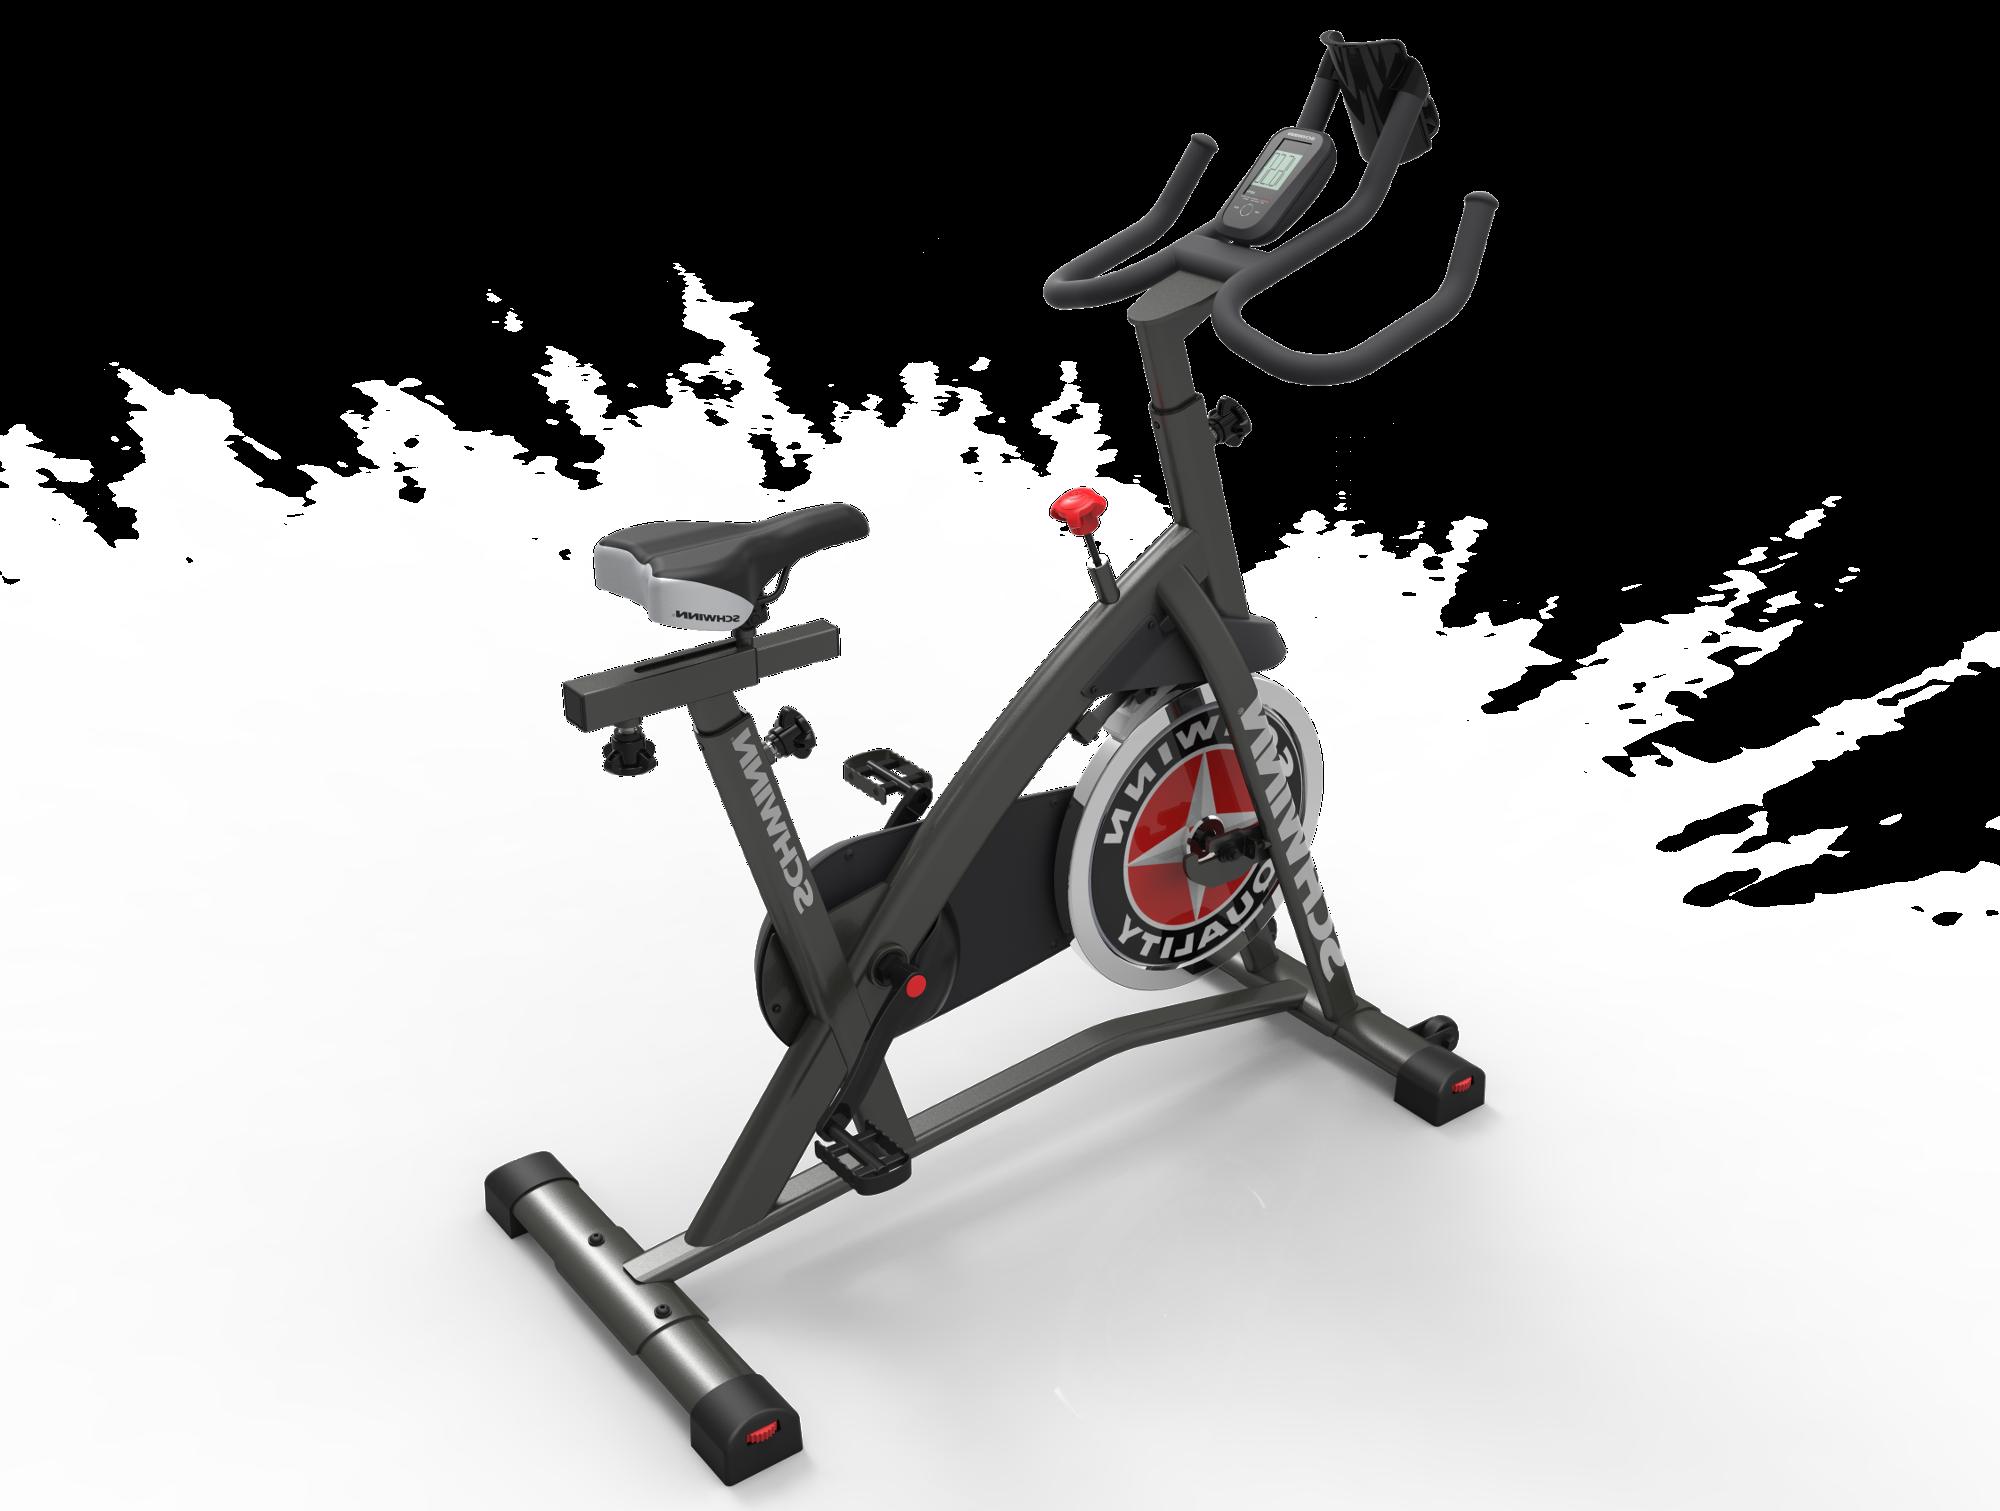 Cyklotrenažér Schwinn IC2